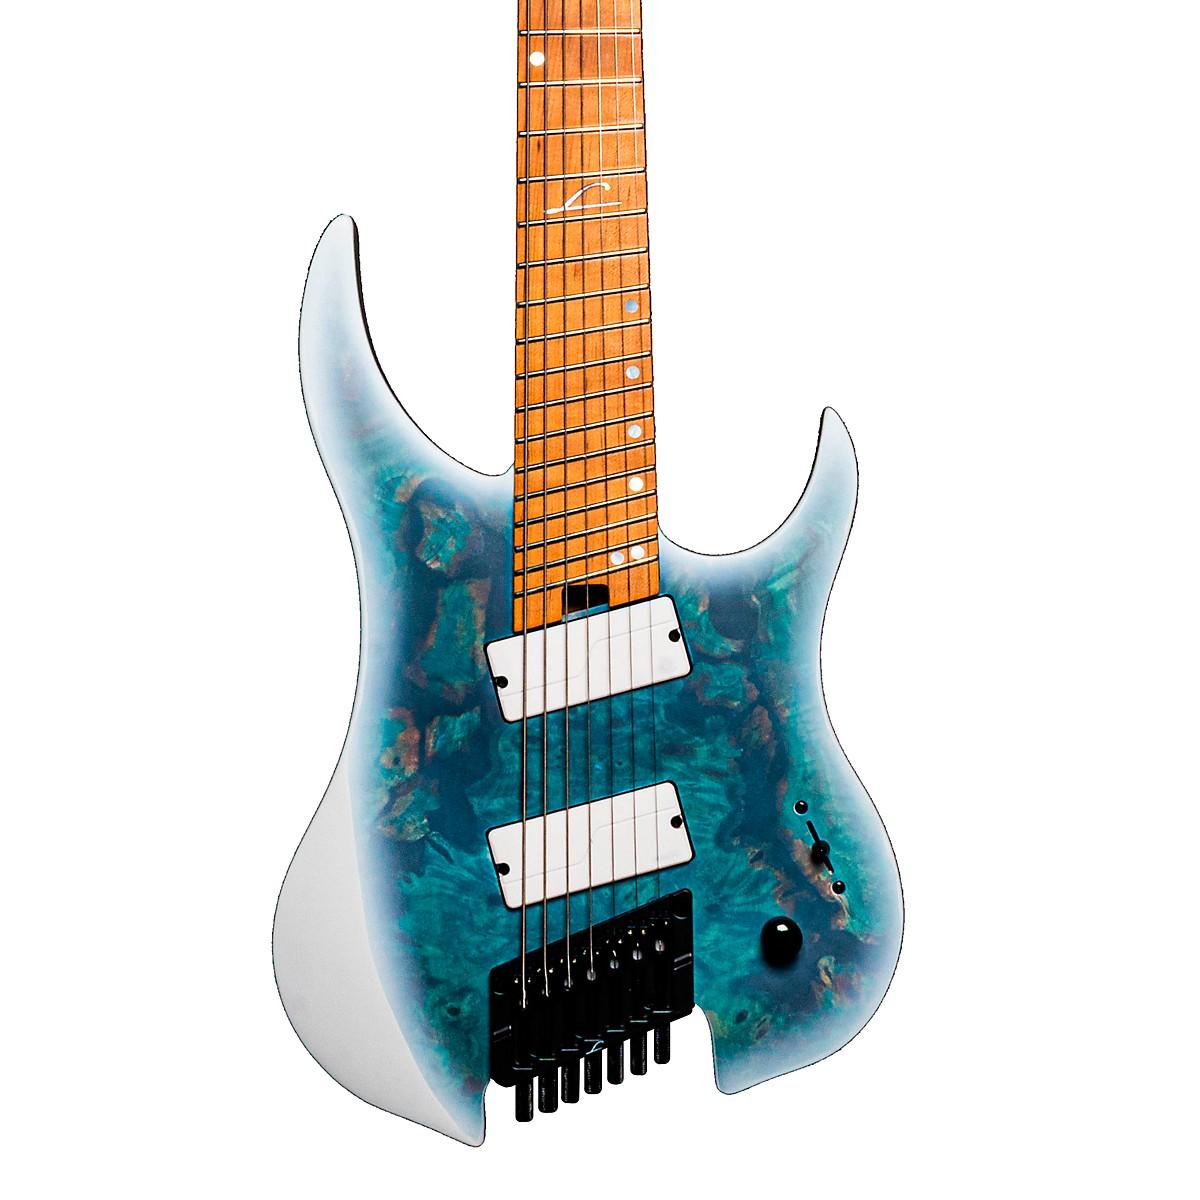 Legator G8FOD Ghost Overdrive 8 Multi-Scale Electric Guitar